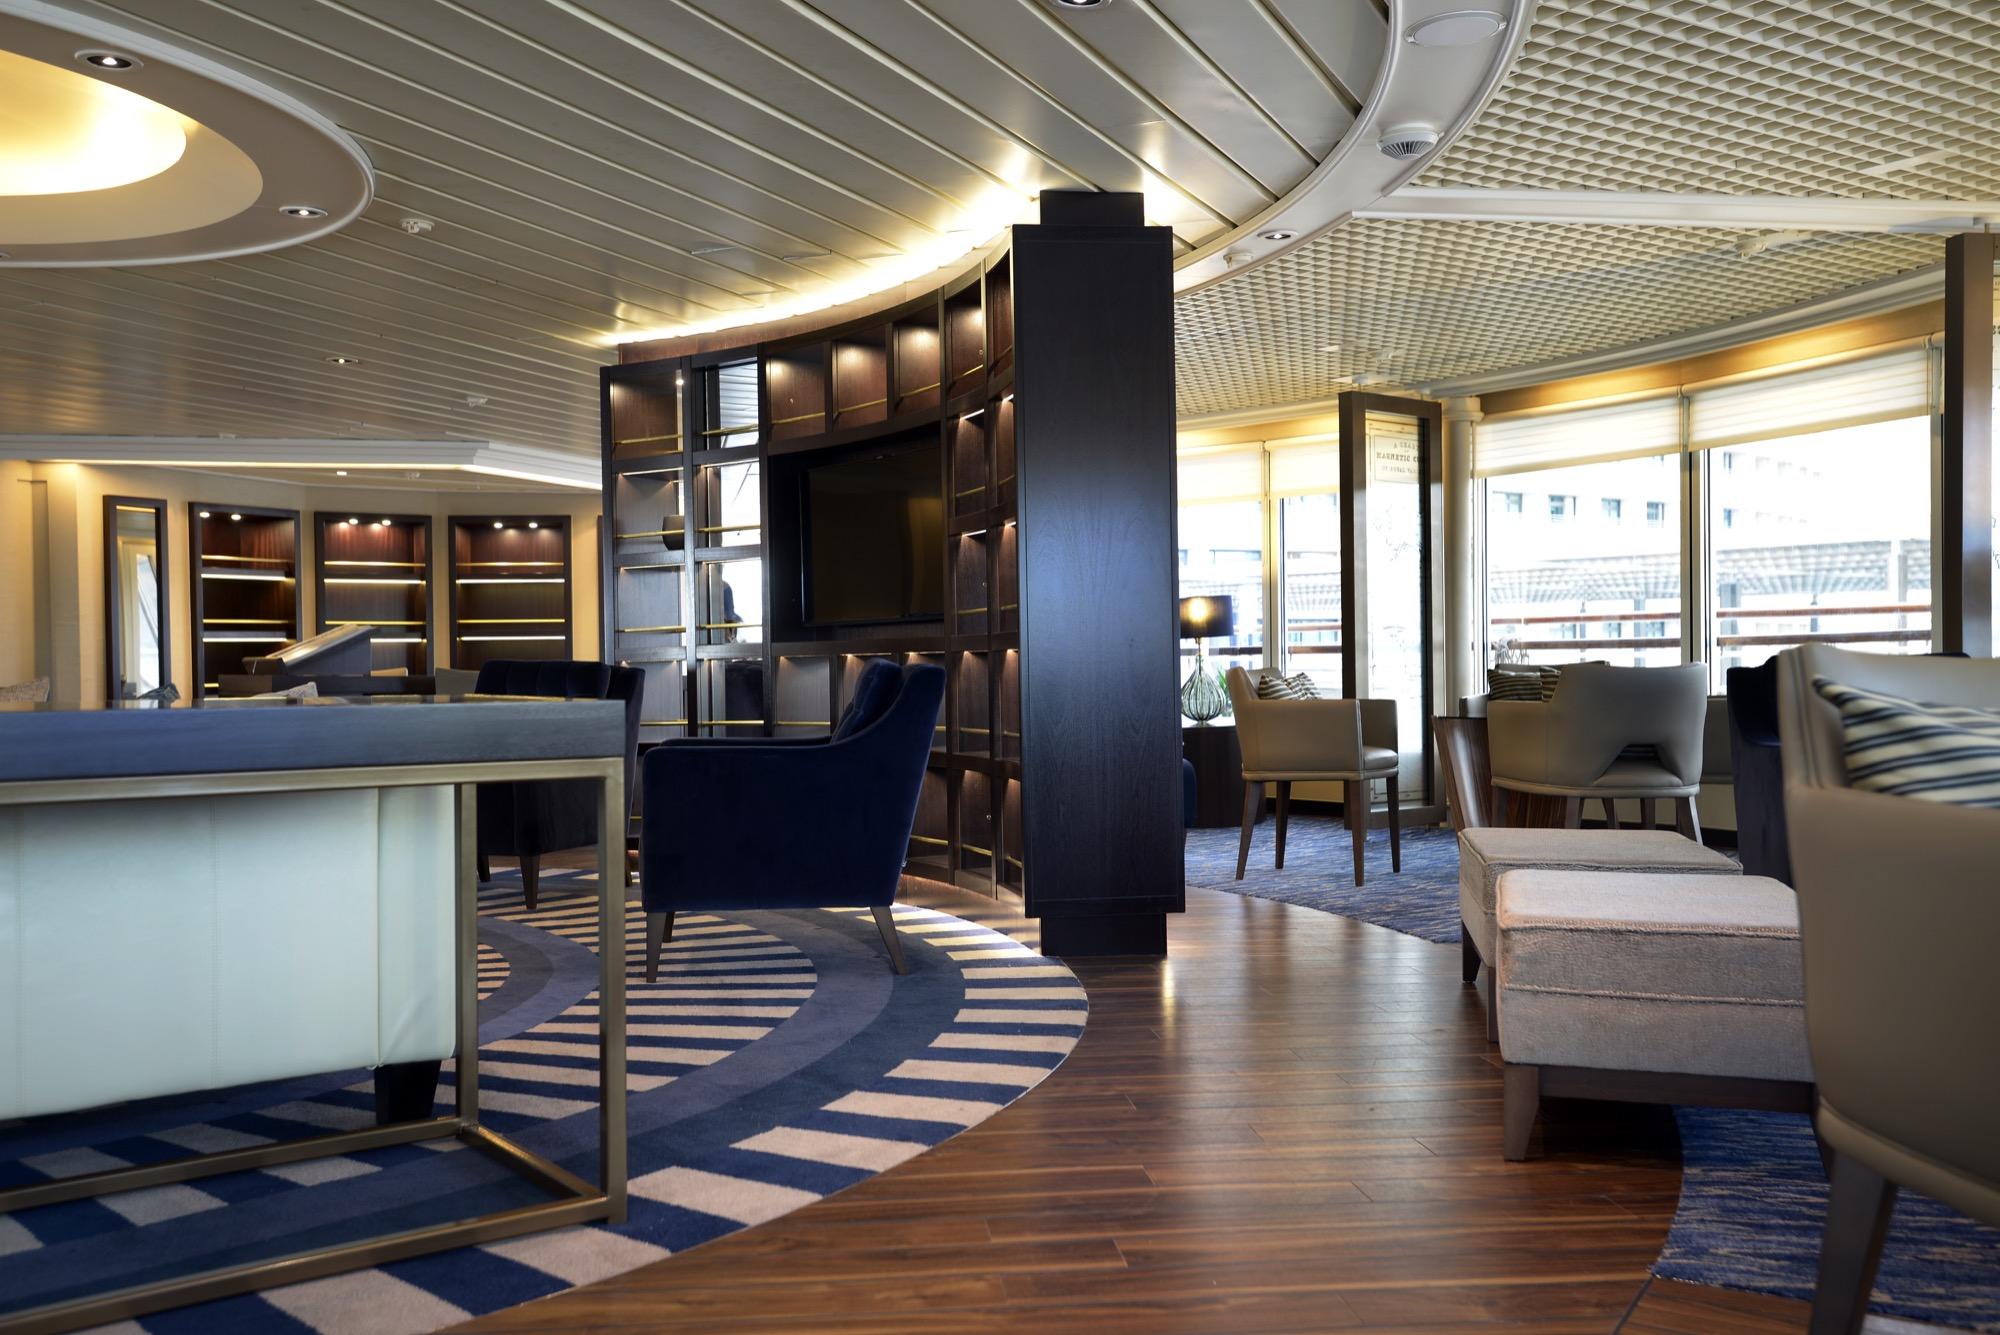 Windstar Star Pride Interior Yacht Club 17.jpg